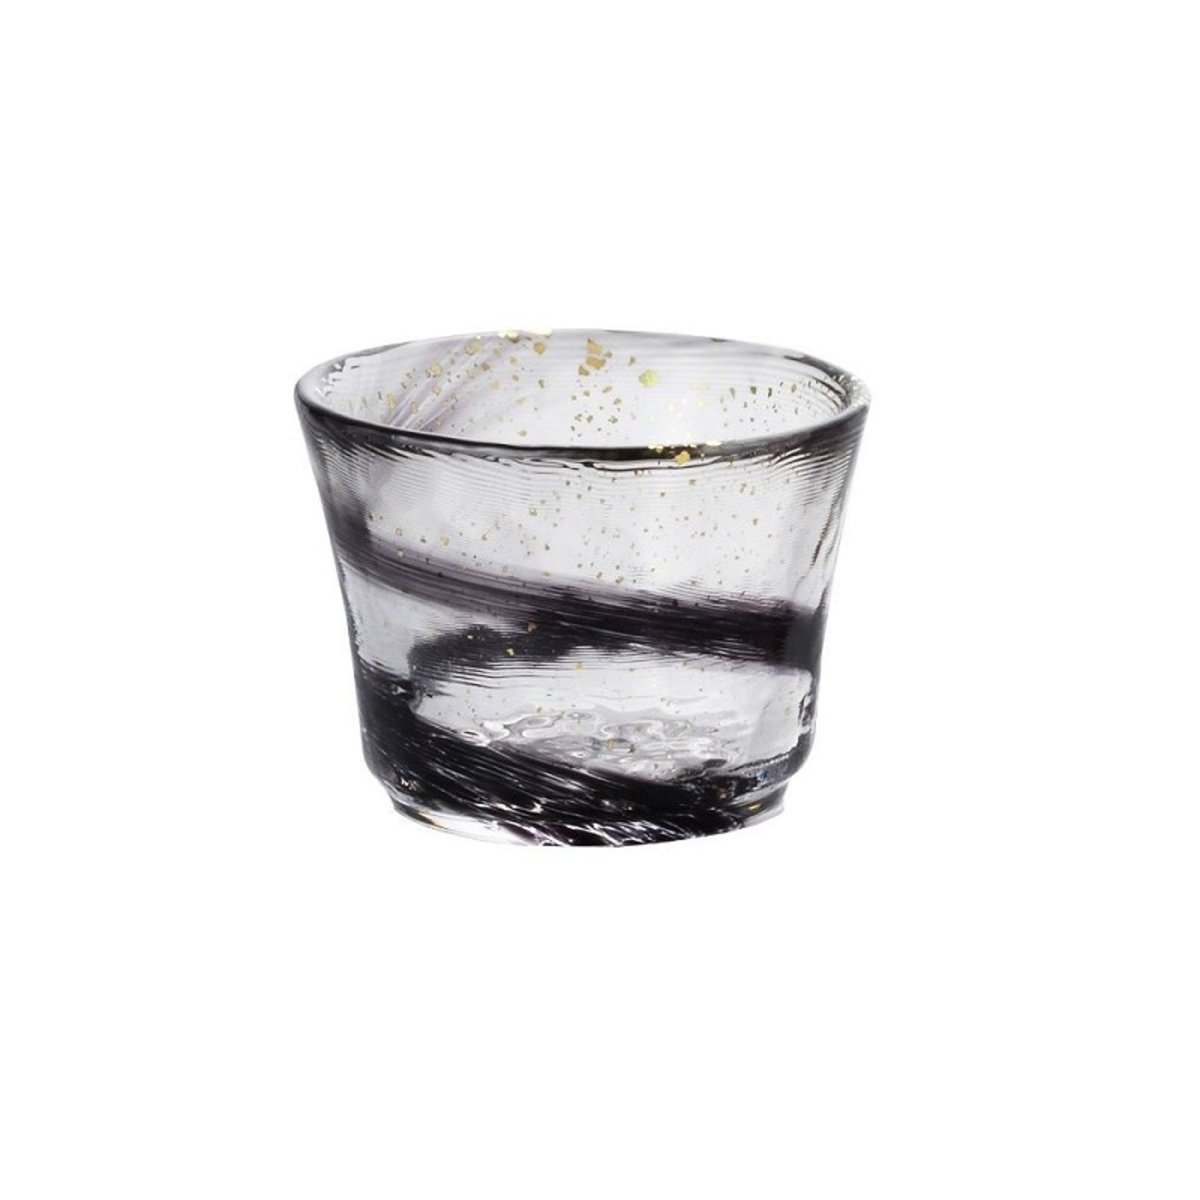 Ishizuka Sake Glass Cup Night Wind - 1pc F-49787